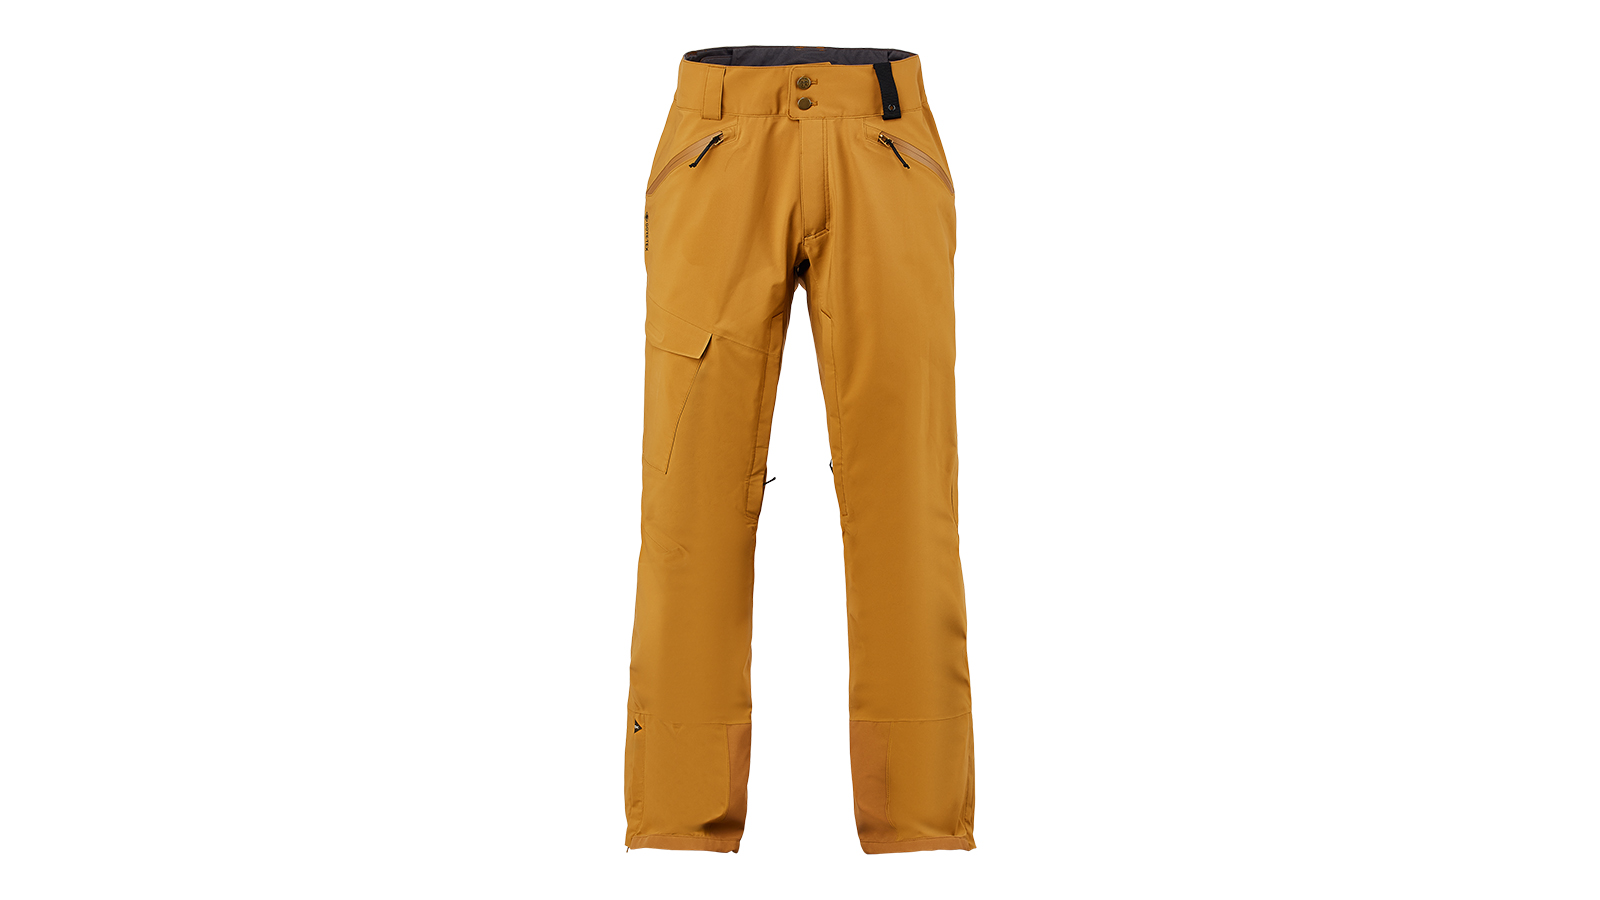 Dakine FW20/21 Men's Outerwear Preview